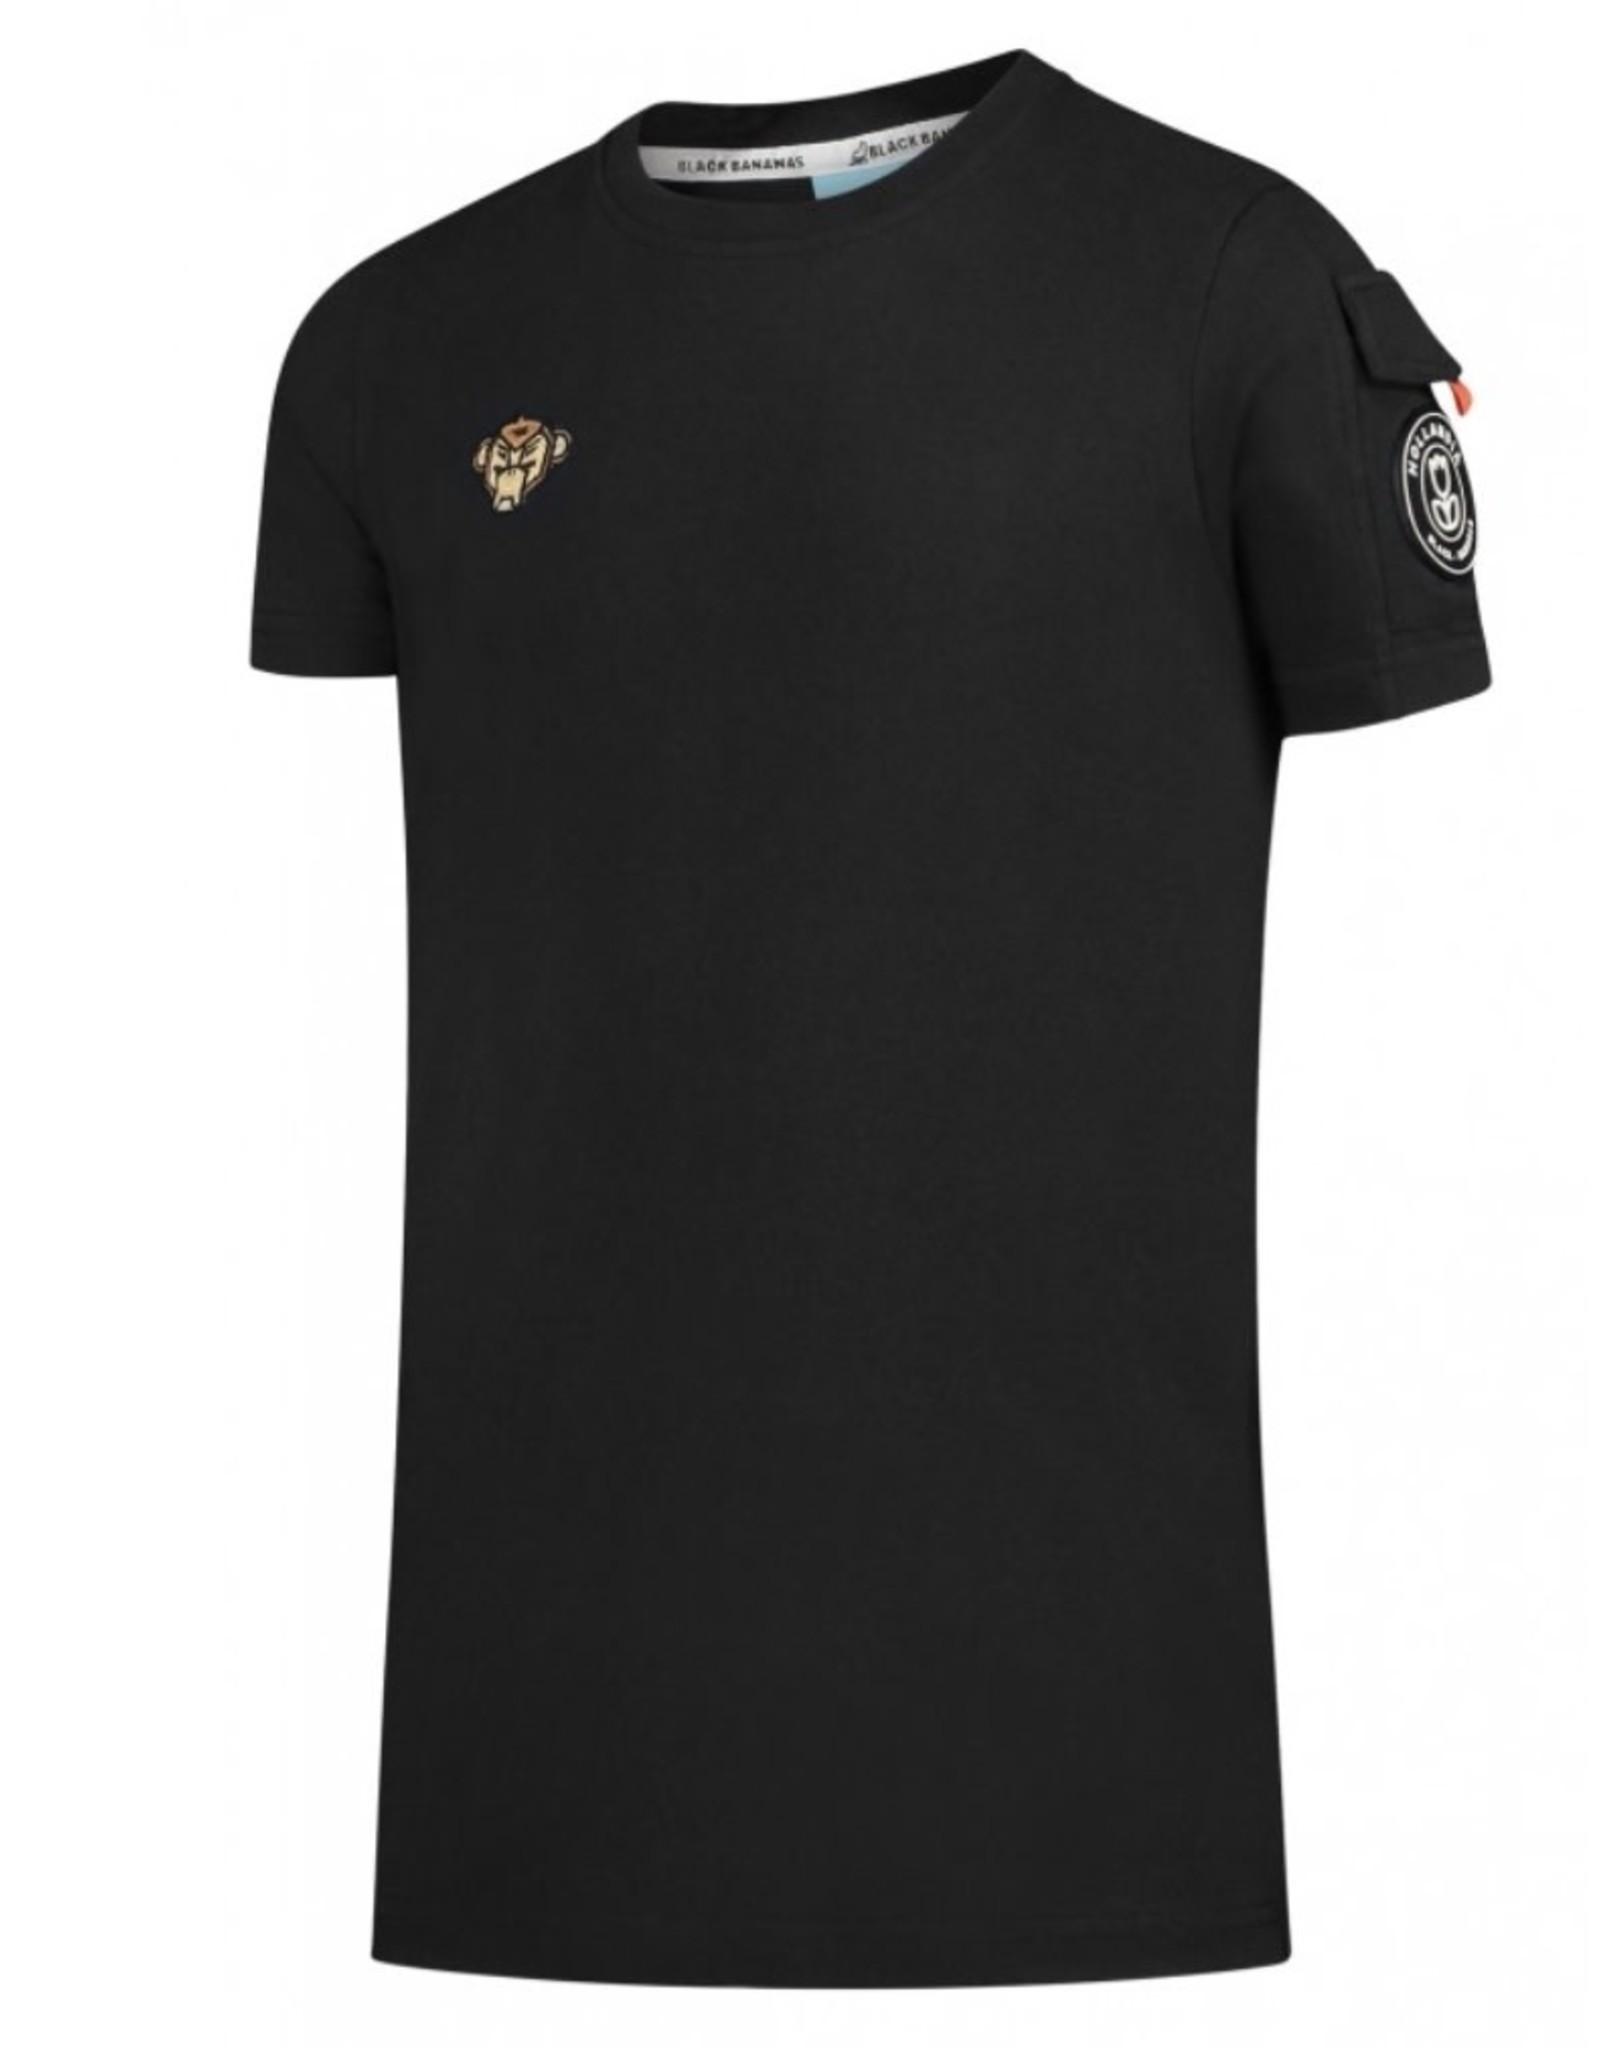 Black Bananas KFW20/010 T-Shirt